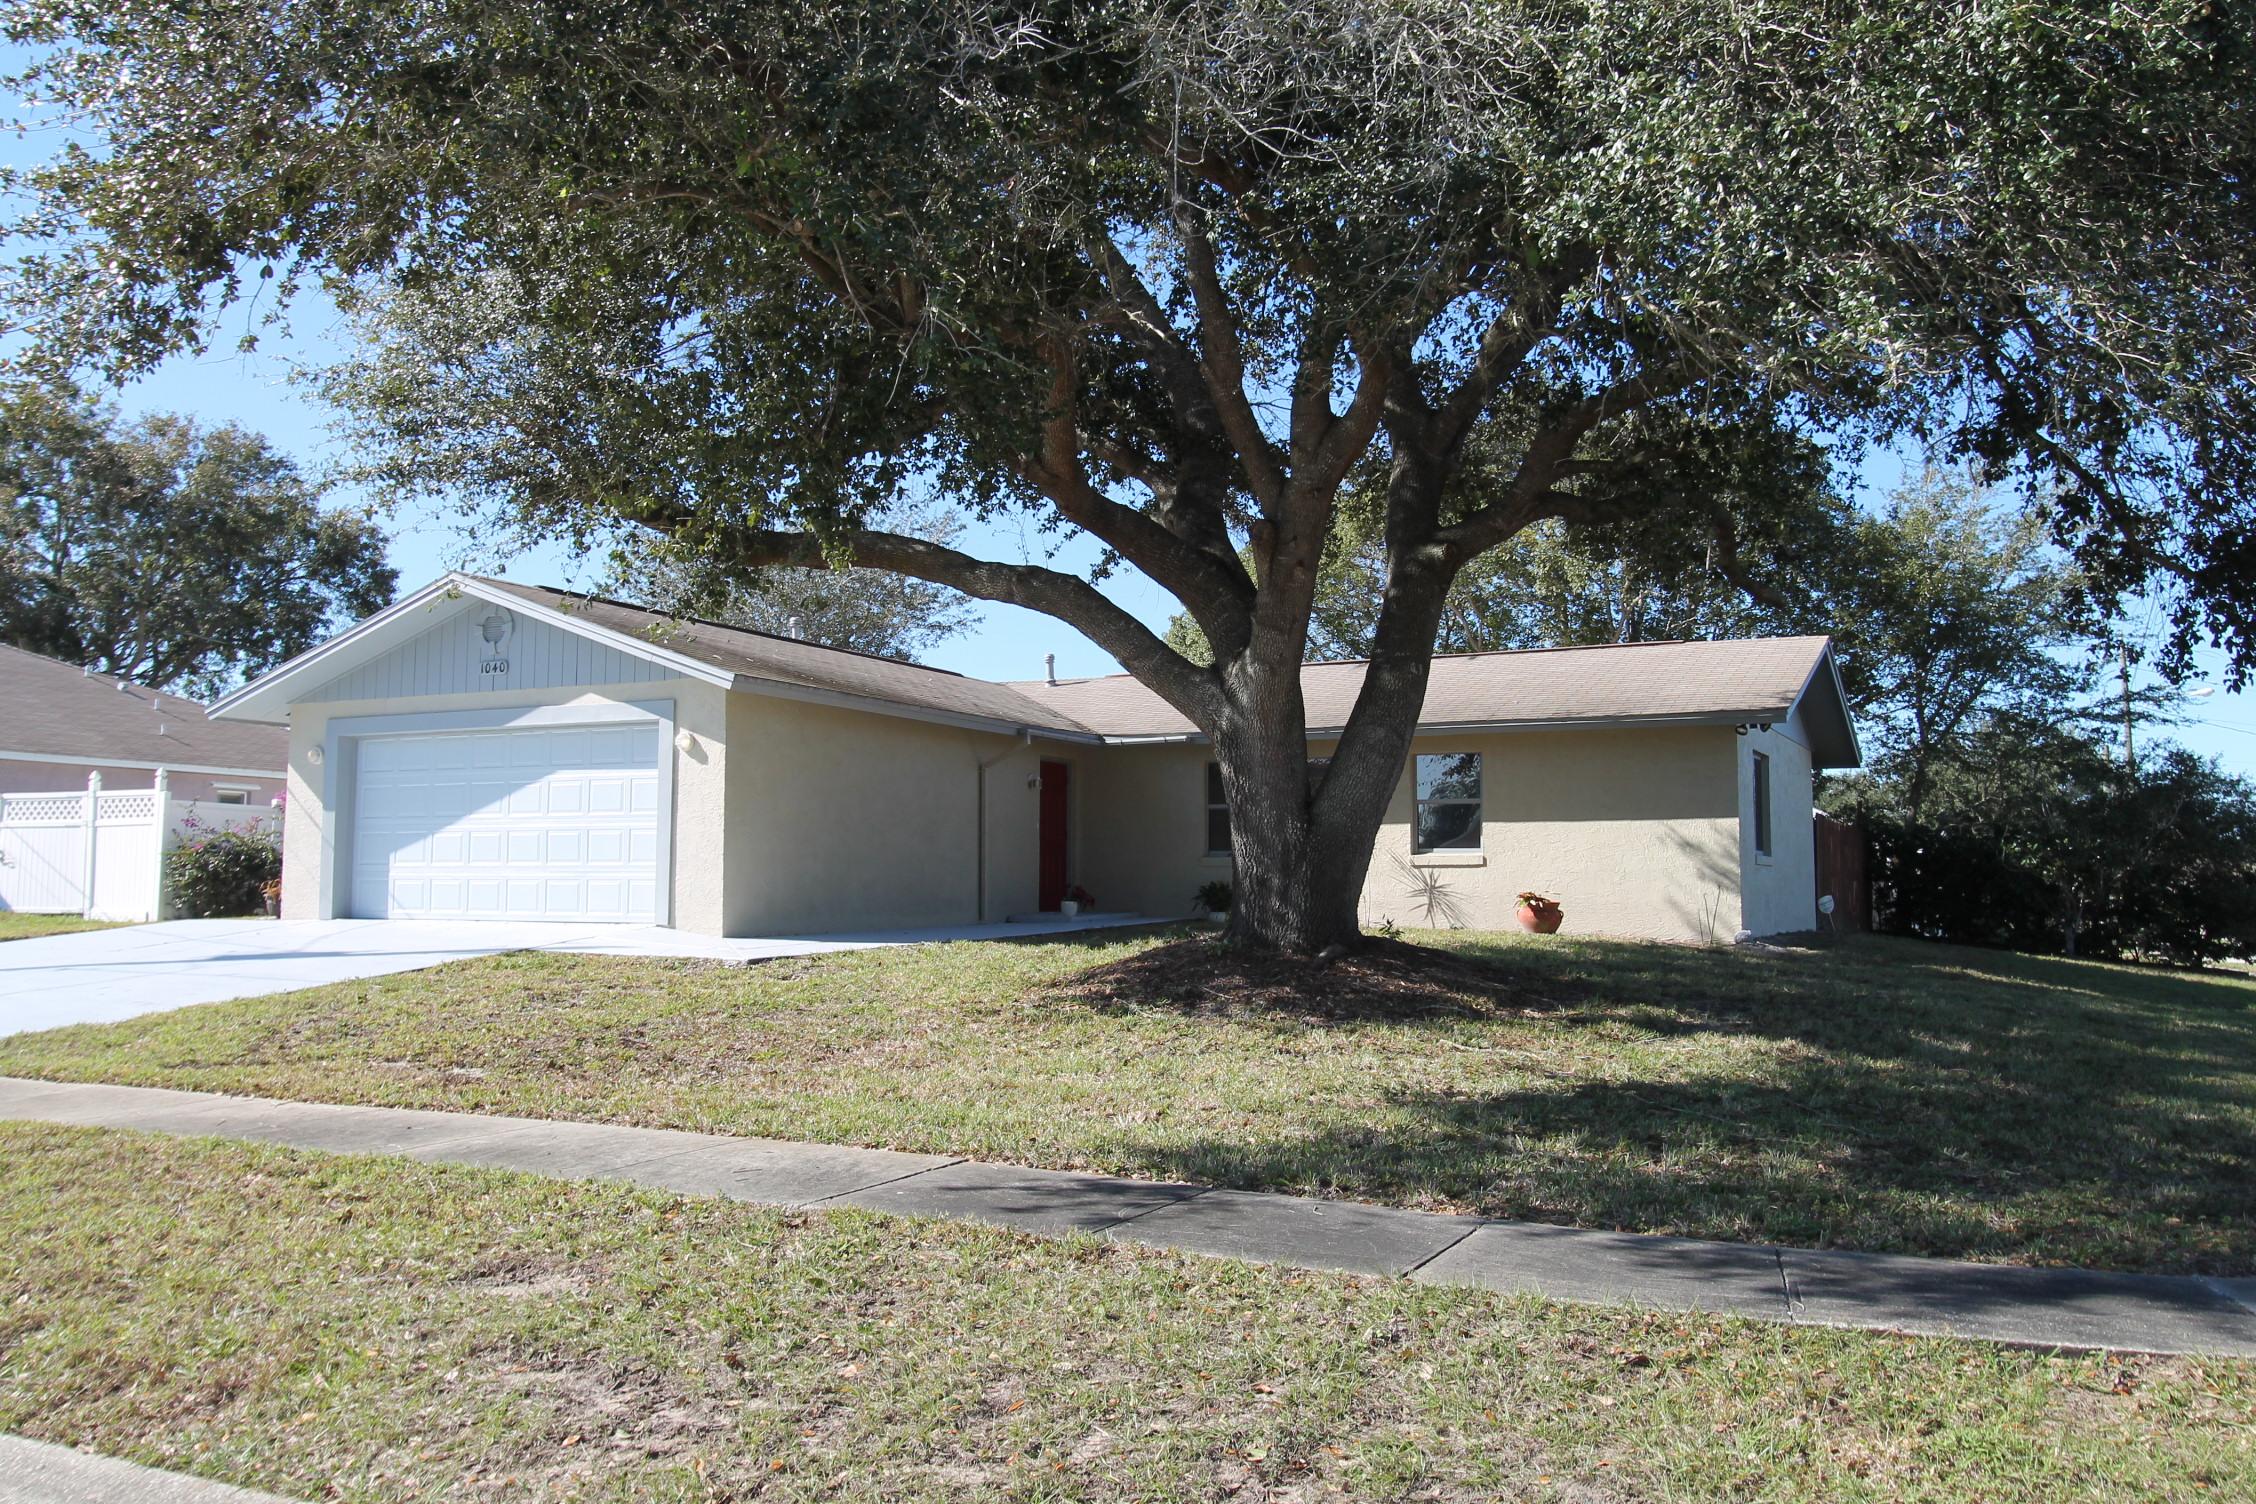 1040 Lovell Dr, Titusville, Florida 32796